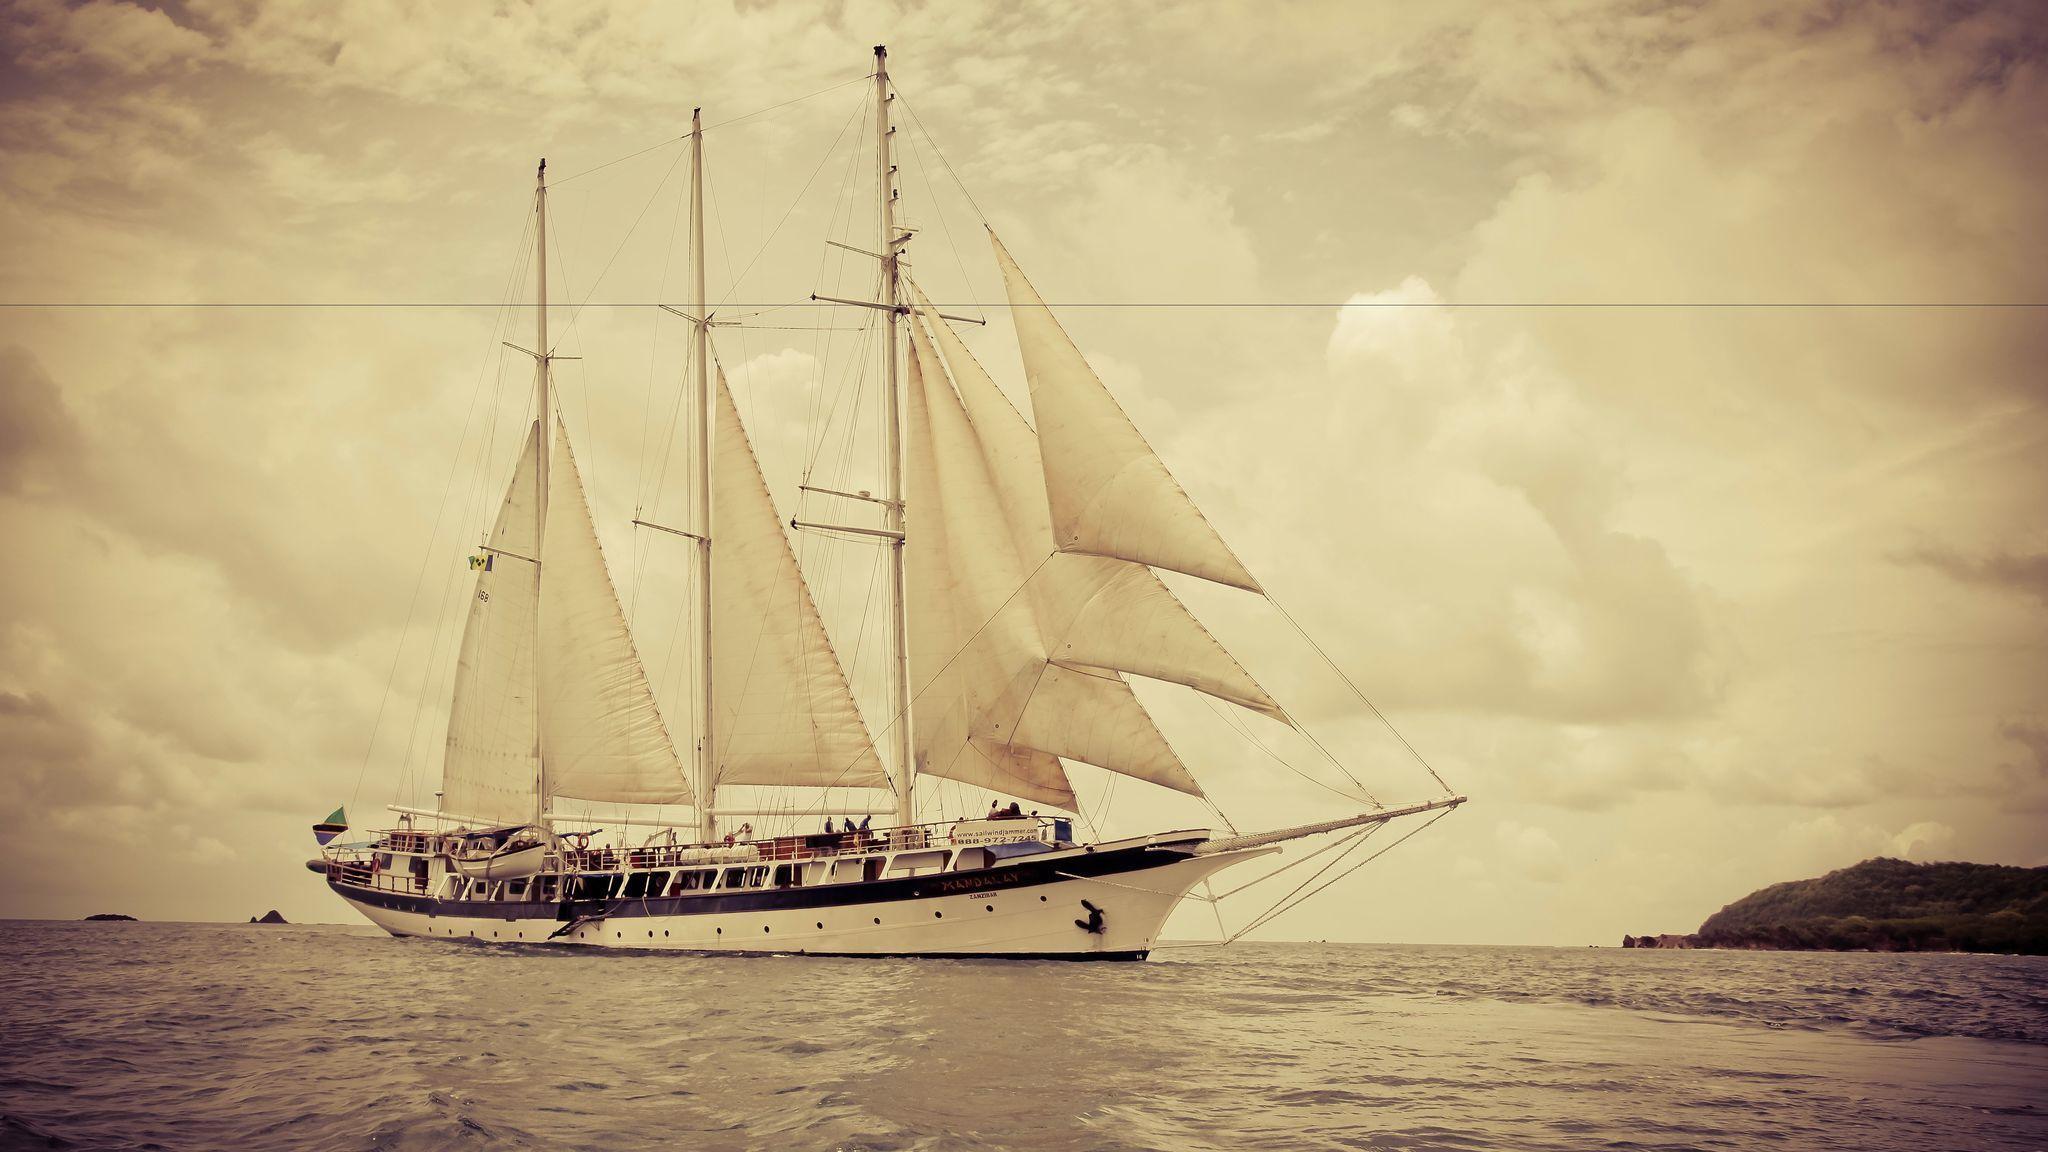 Windjammer singles cruises Windjammer Cruises, Liberty Fleet of Tall Ships